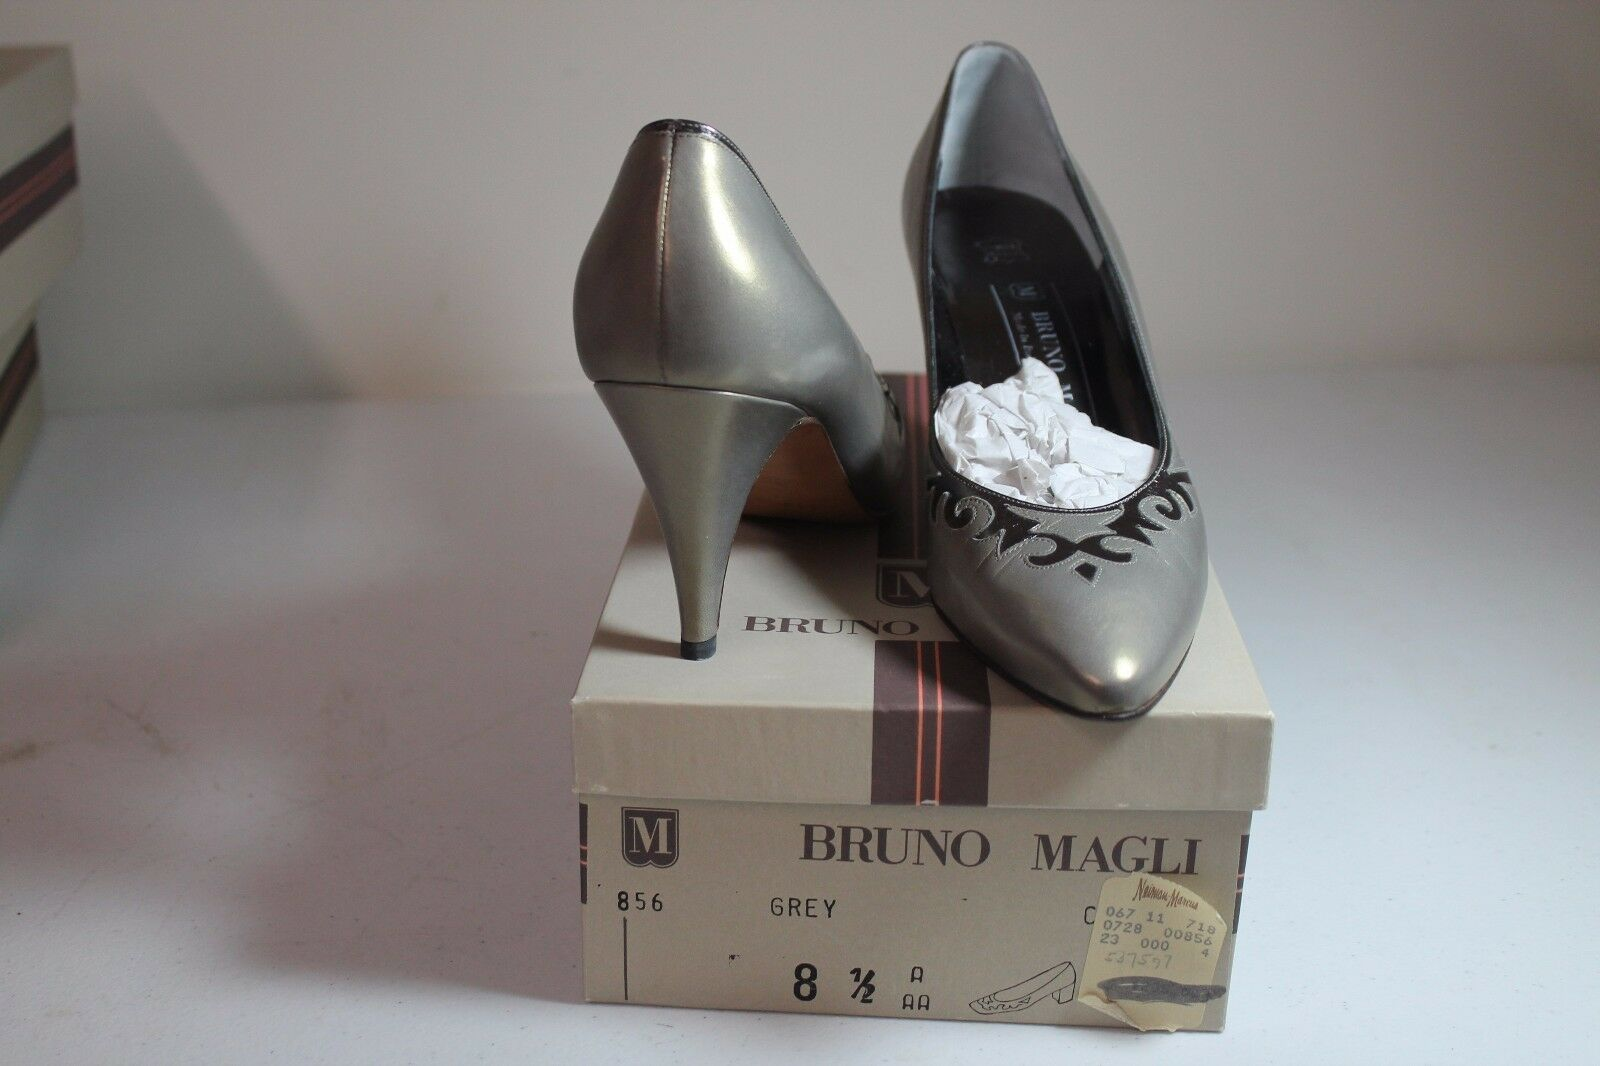 Italian Bruno Magli Damenschuhe Classic Leder Grau Shine Heel SZ 8.5 AAA